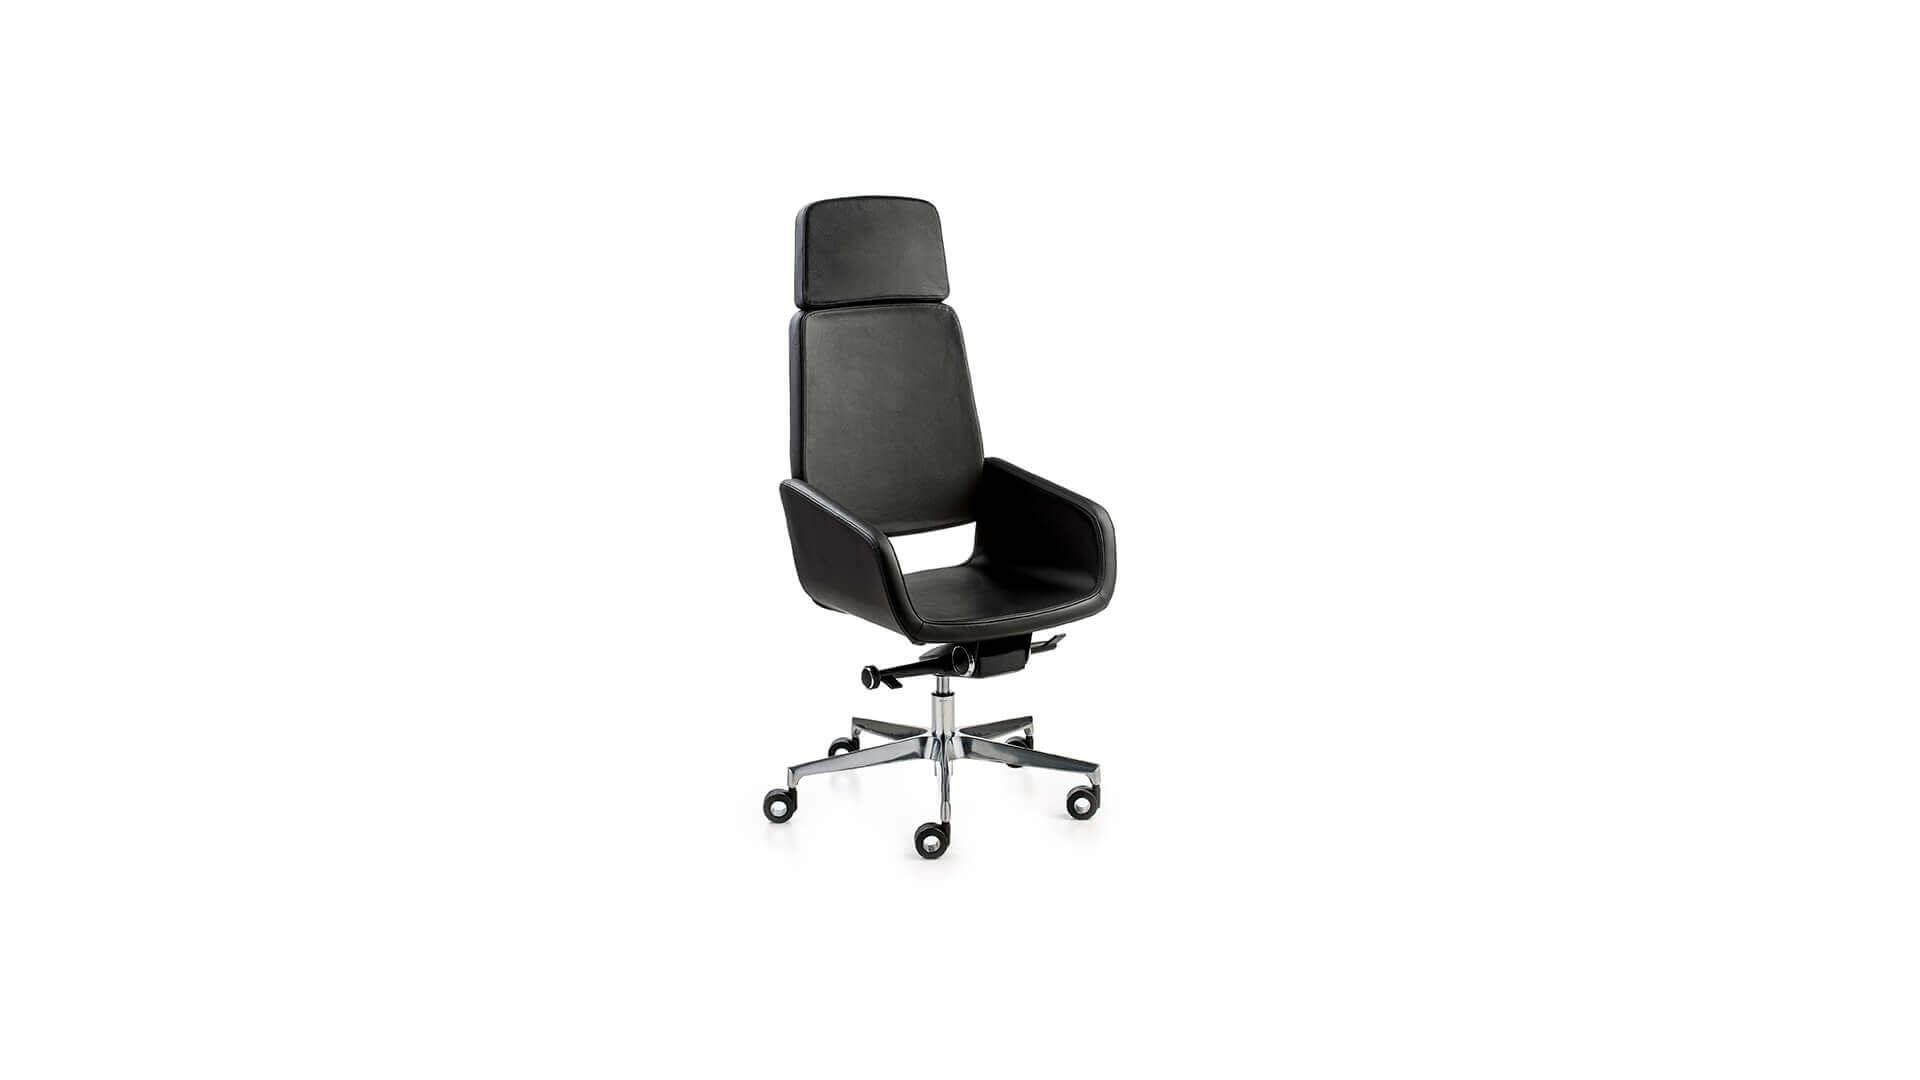 silla de dirección aita diseñada por Aitor Garcia